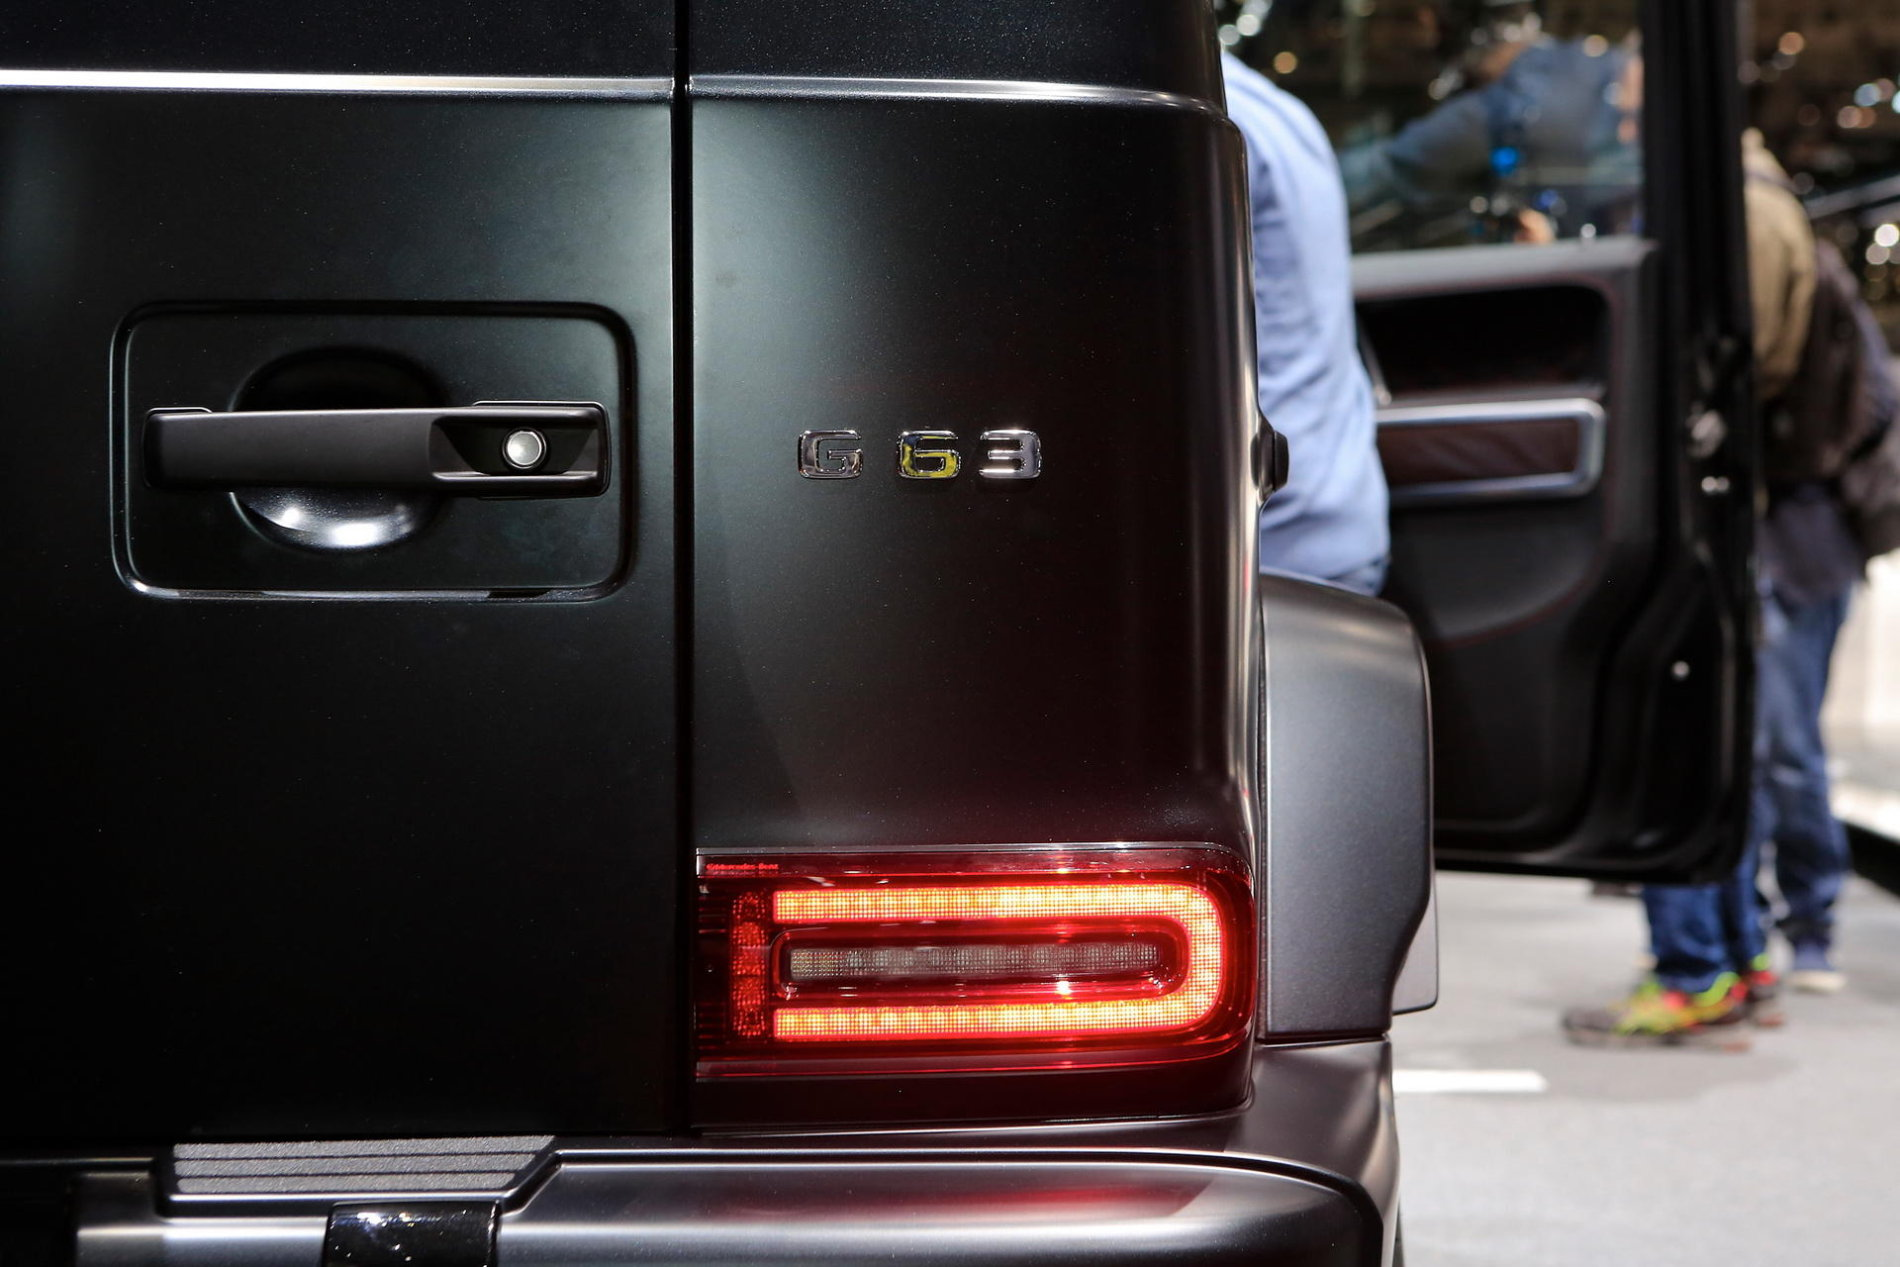 2018 Mercedes-AMG G63 - 2018 Mercedes-AMG G63